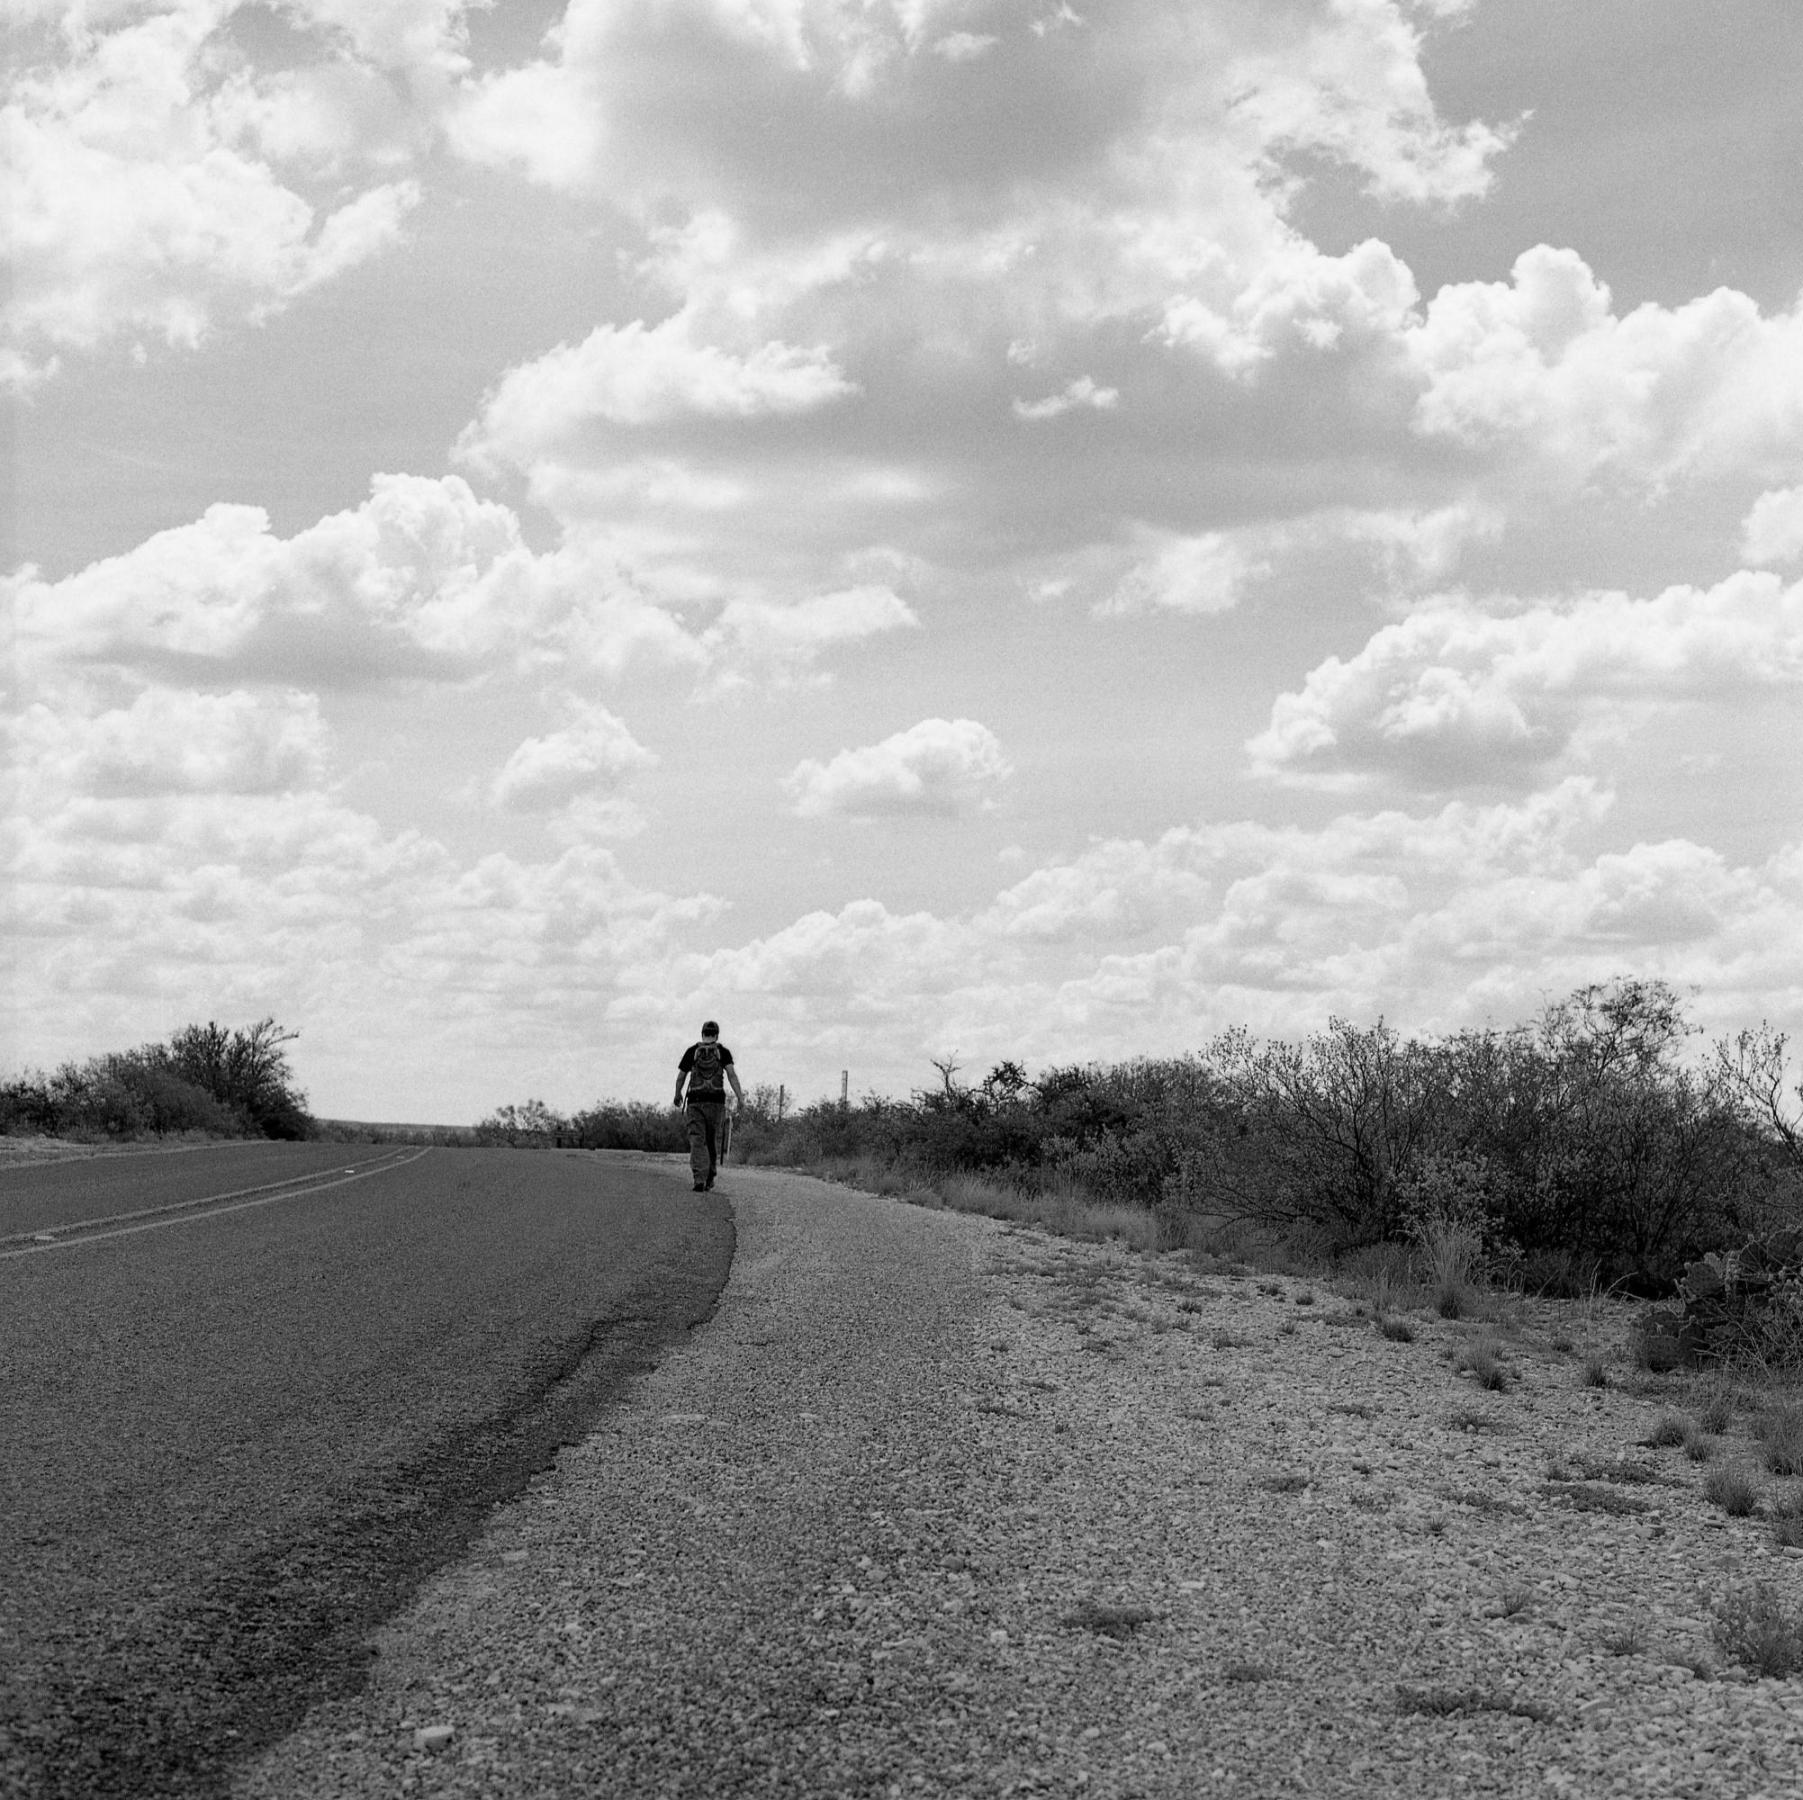 walt on the road-3681sm.JPG